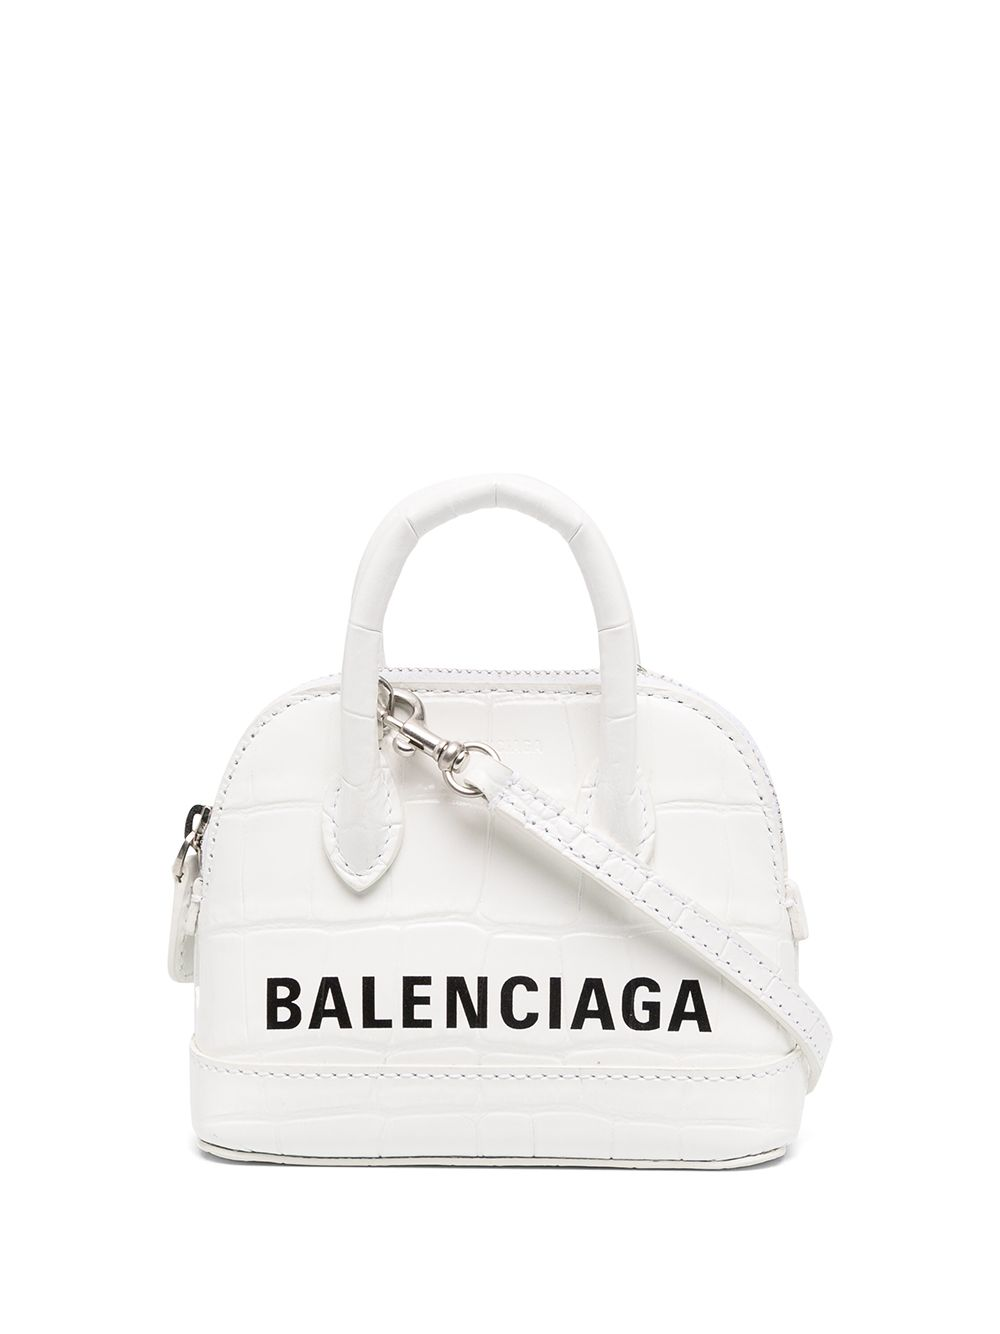 Ville Leather Handbag